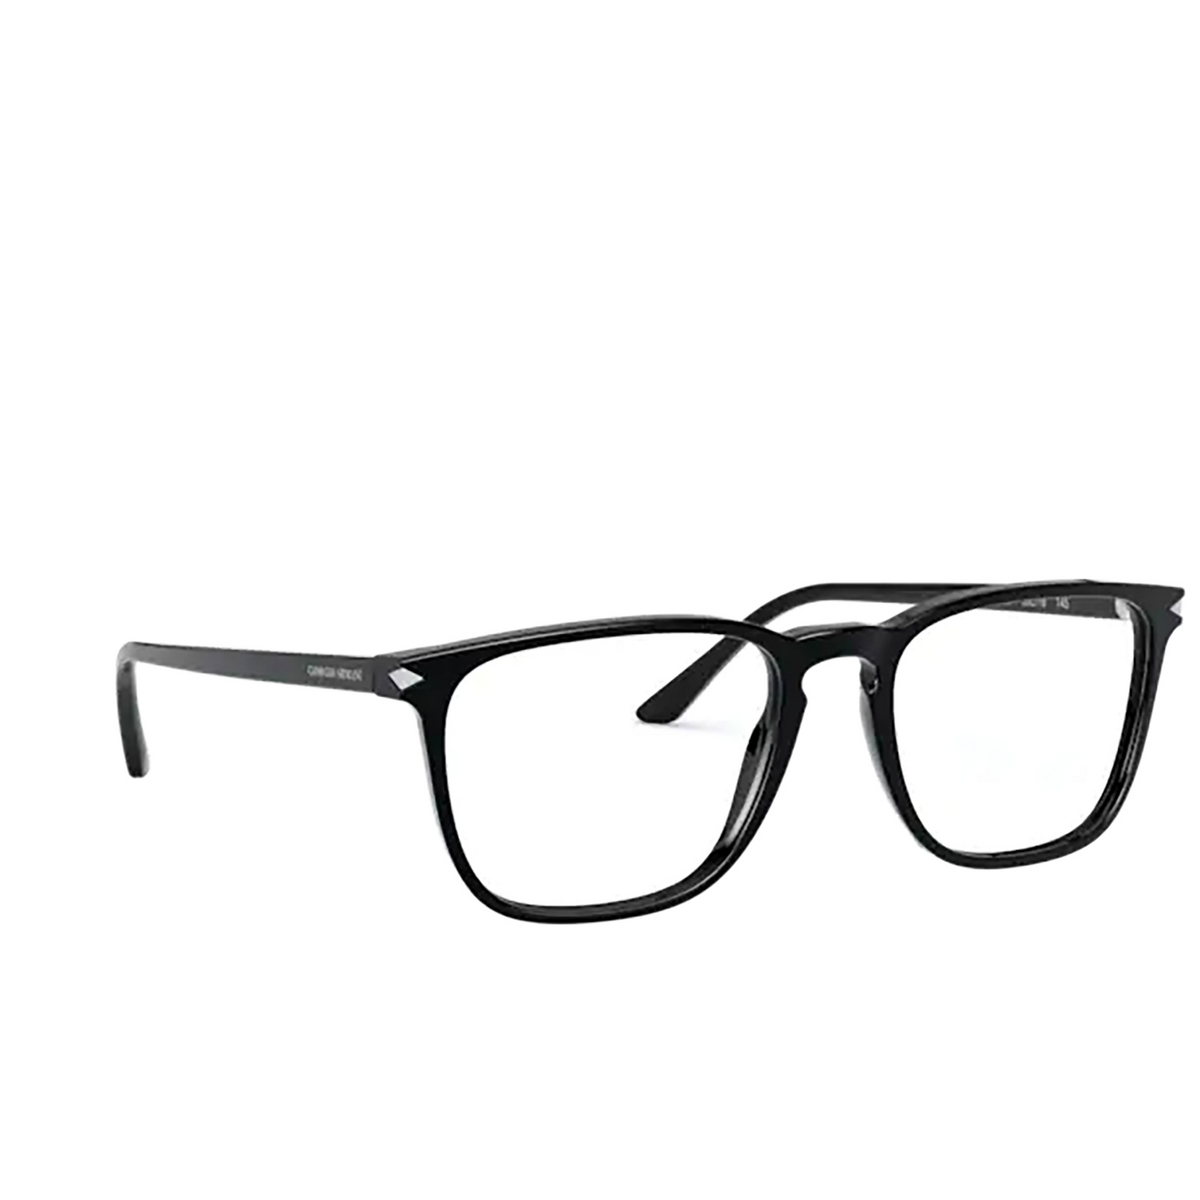 Giorgio Armani® Square Eyeglasses: AR7193 color Black 5001 - three-quarters view.